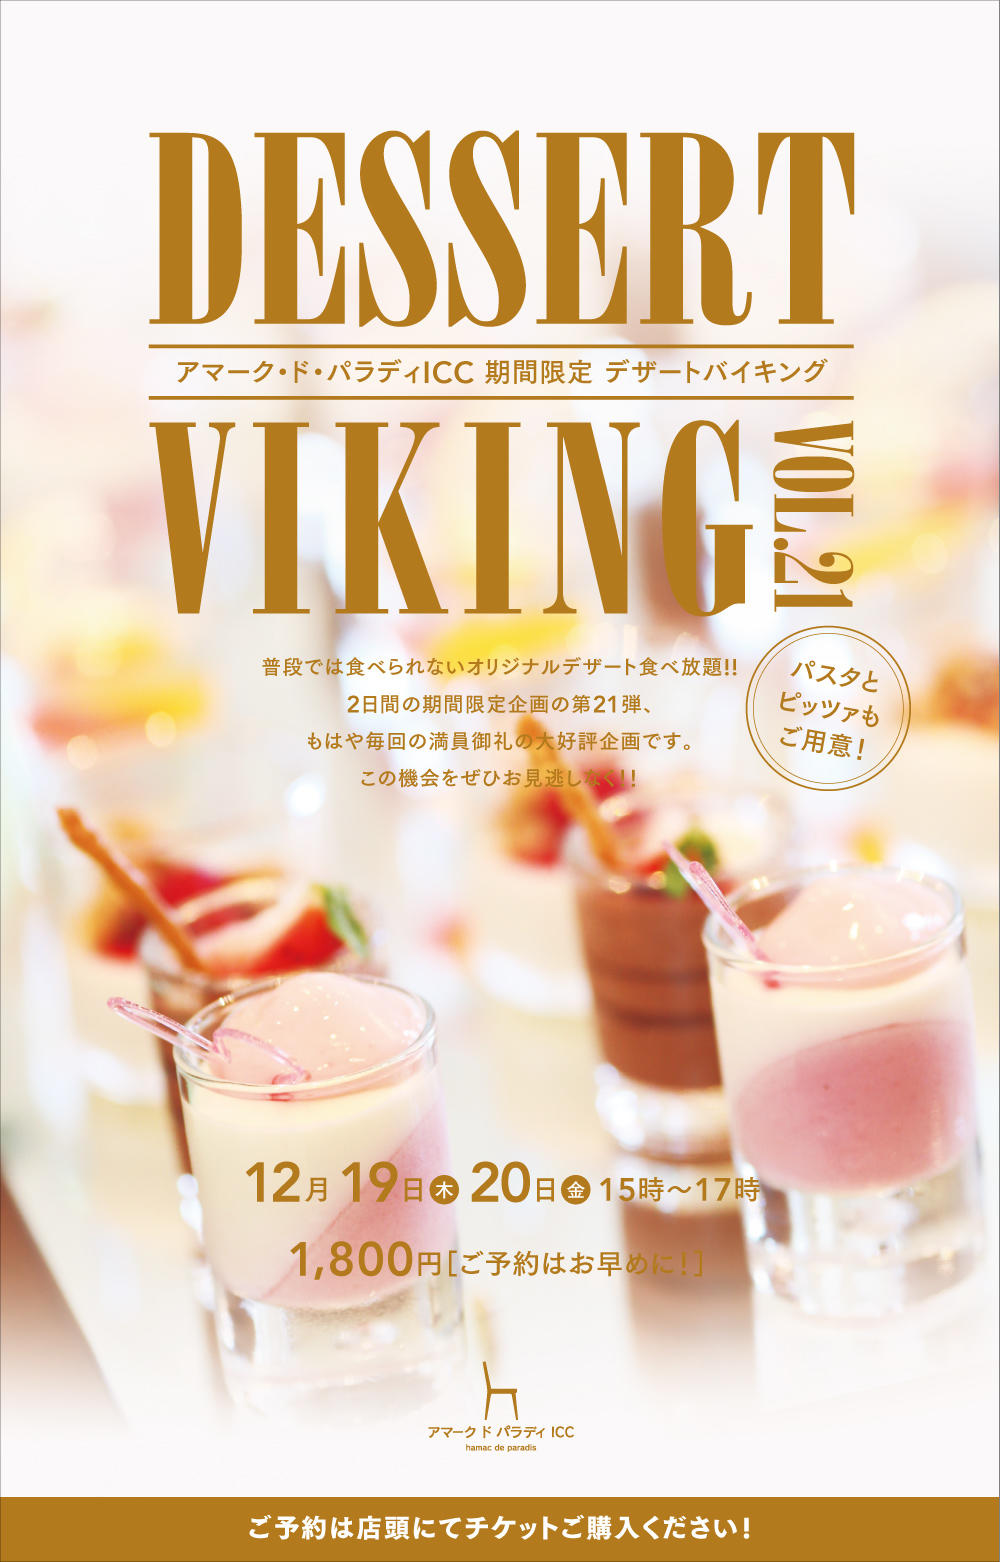 icc_dessert21.jpg